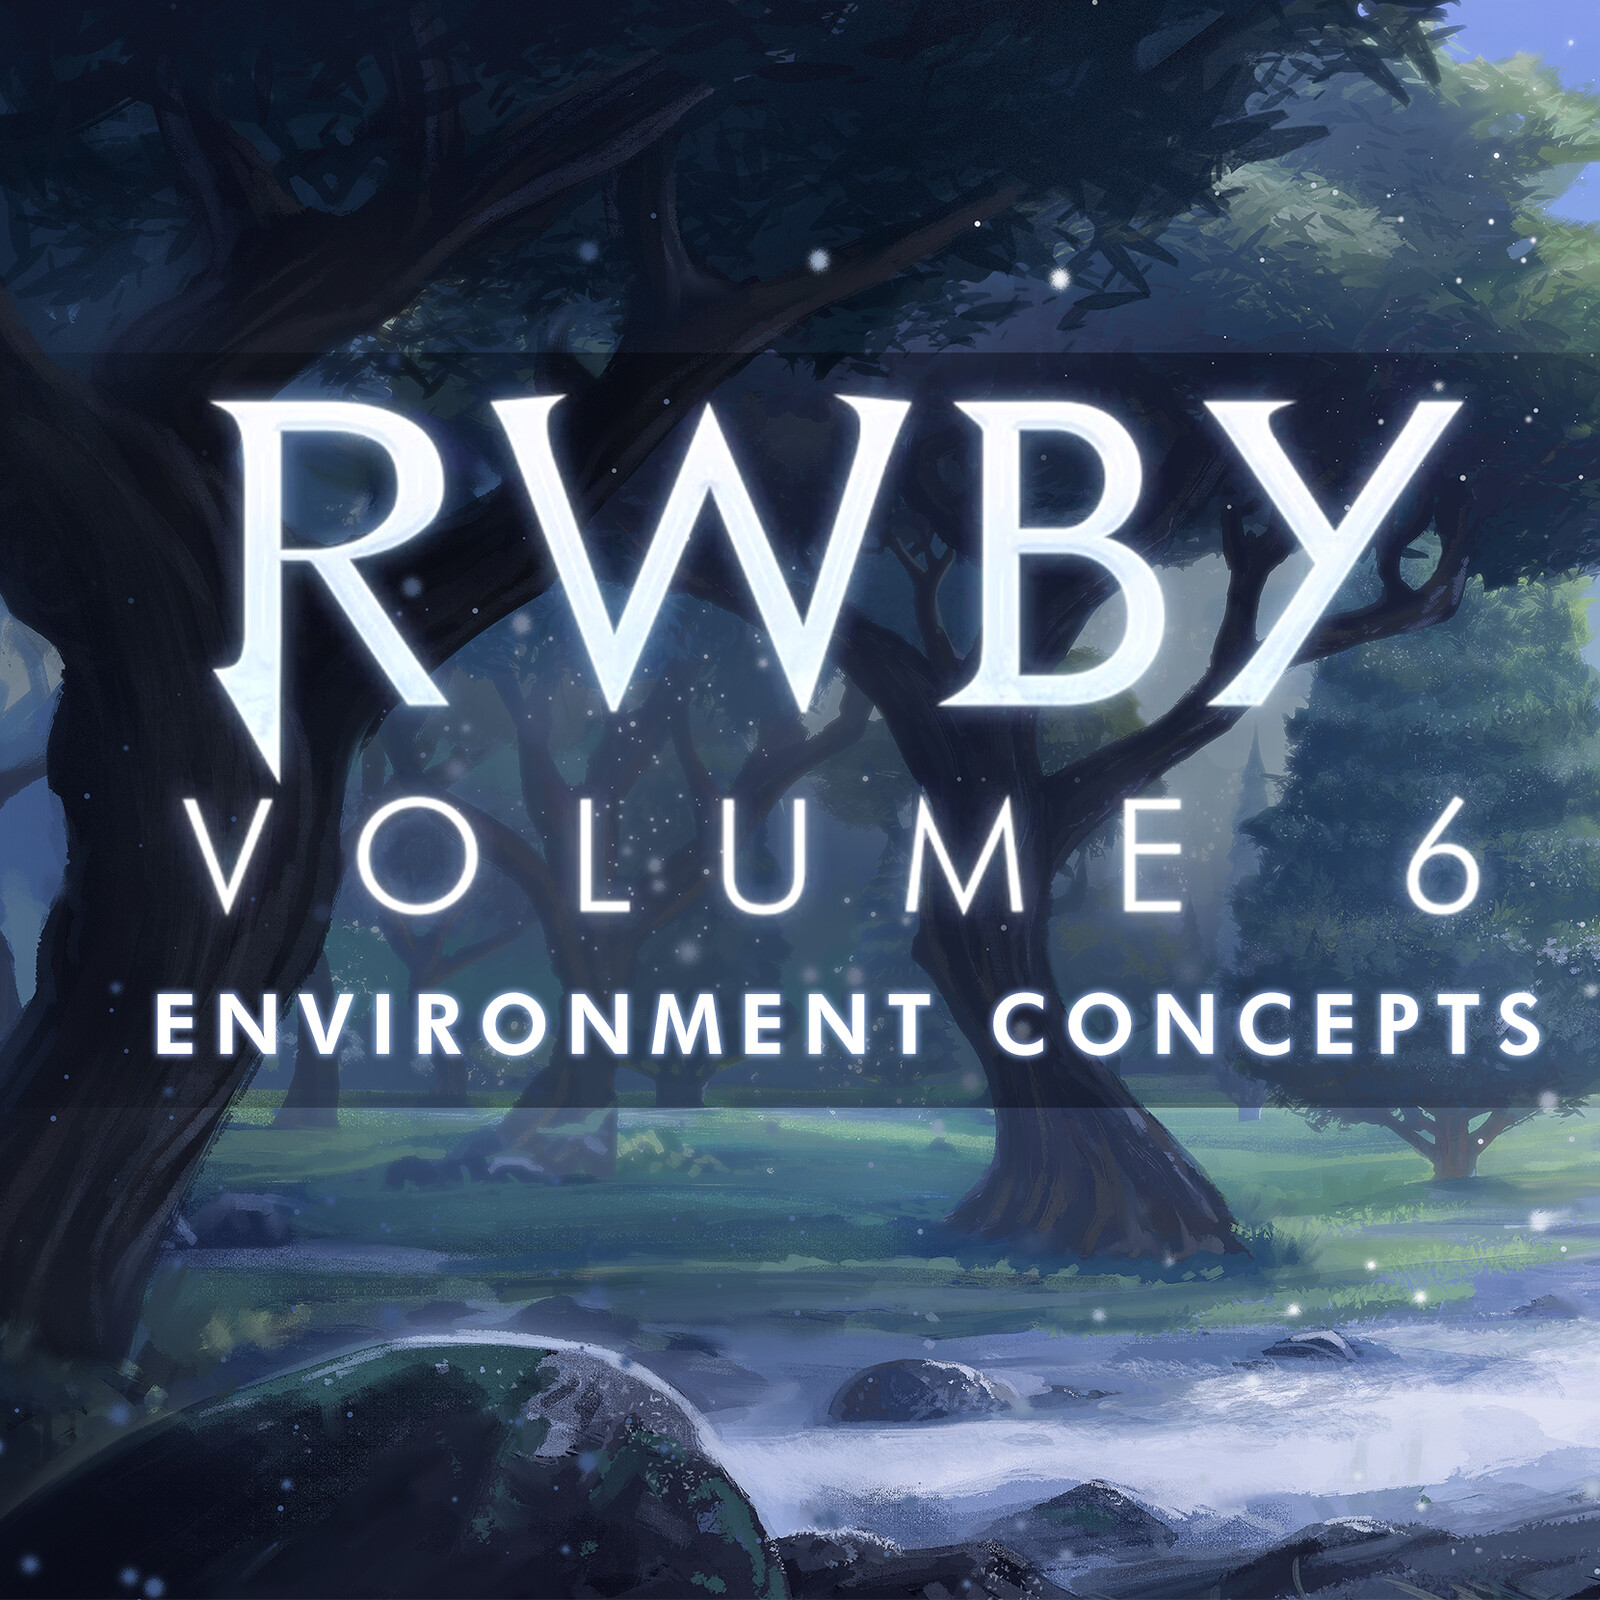 RWBY Volume 6 - Environment Concepts